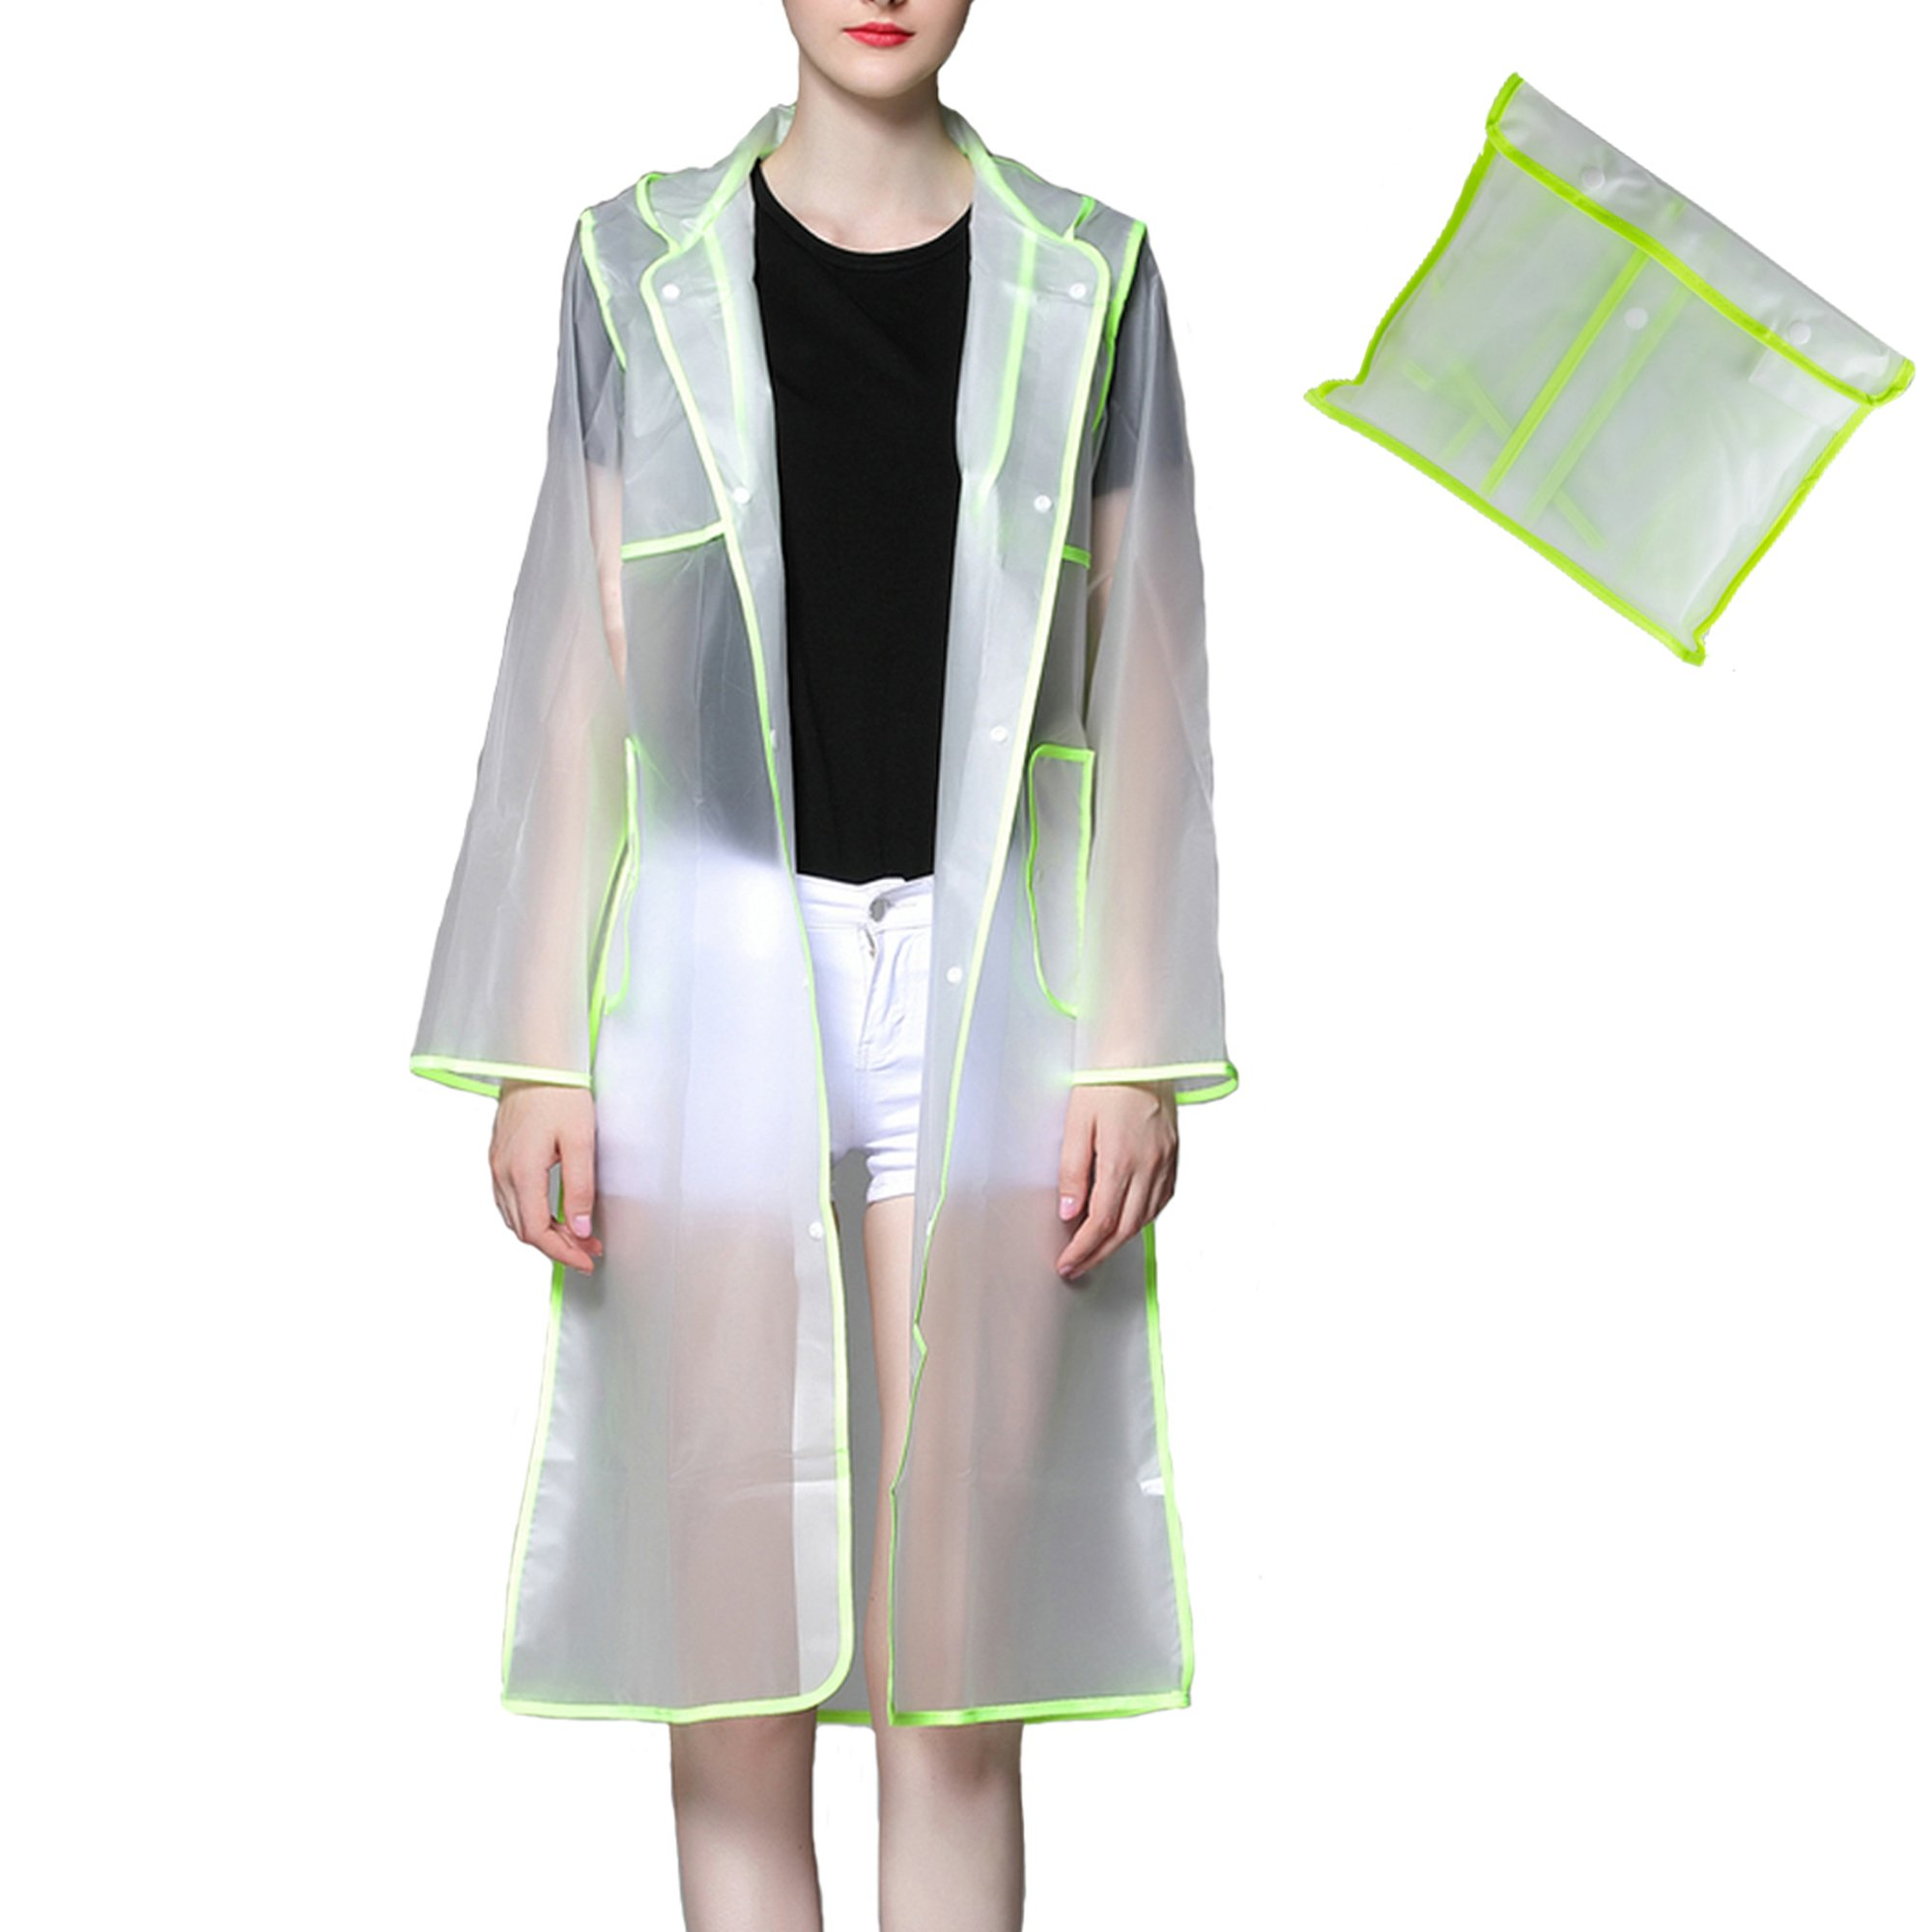 Womens Waterproof Hooded Raincoat Lightweight Easy Carry Semi-transparent Poncho Runaway Style Reusable Rainwear (X-Large, Green)